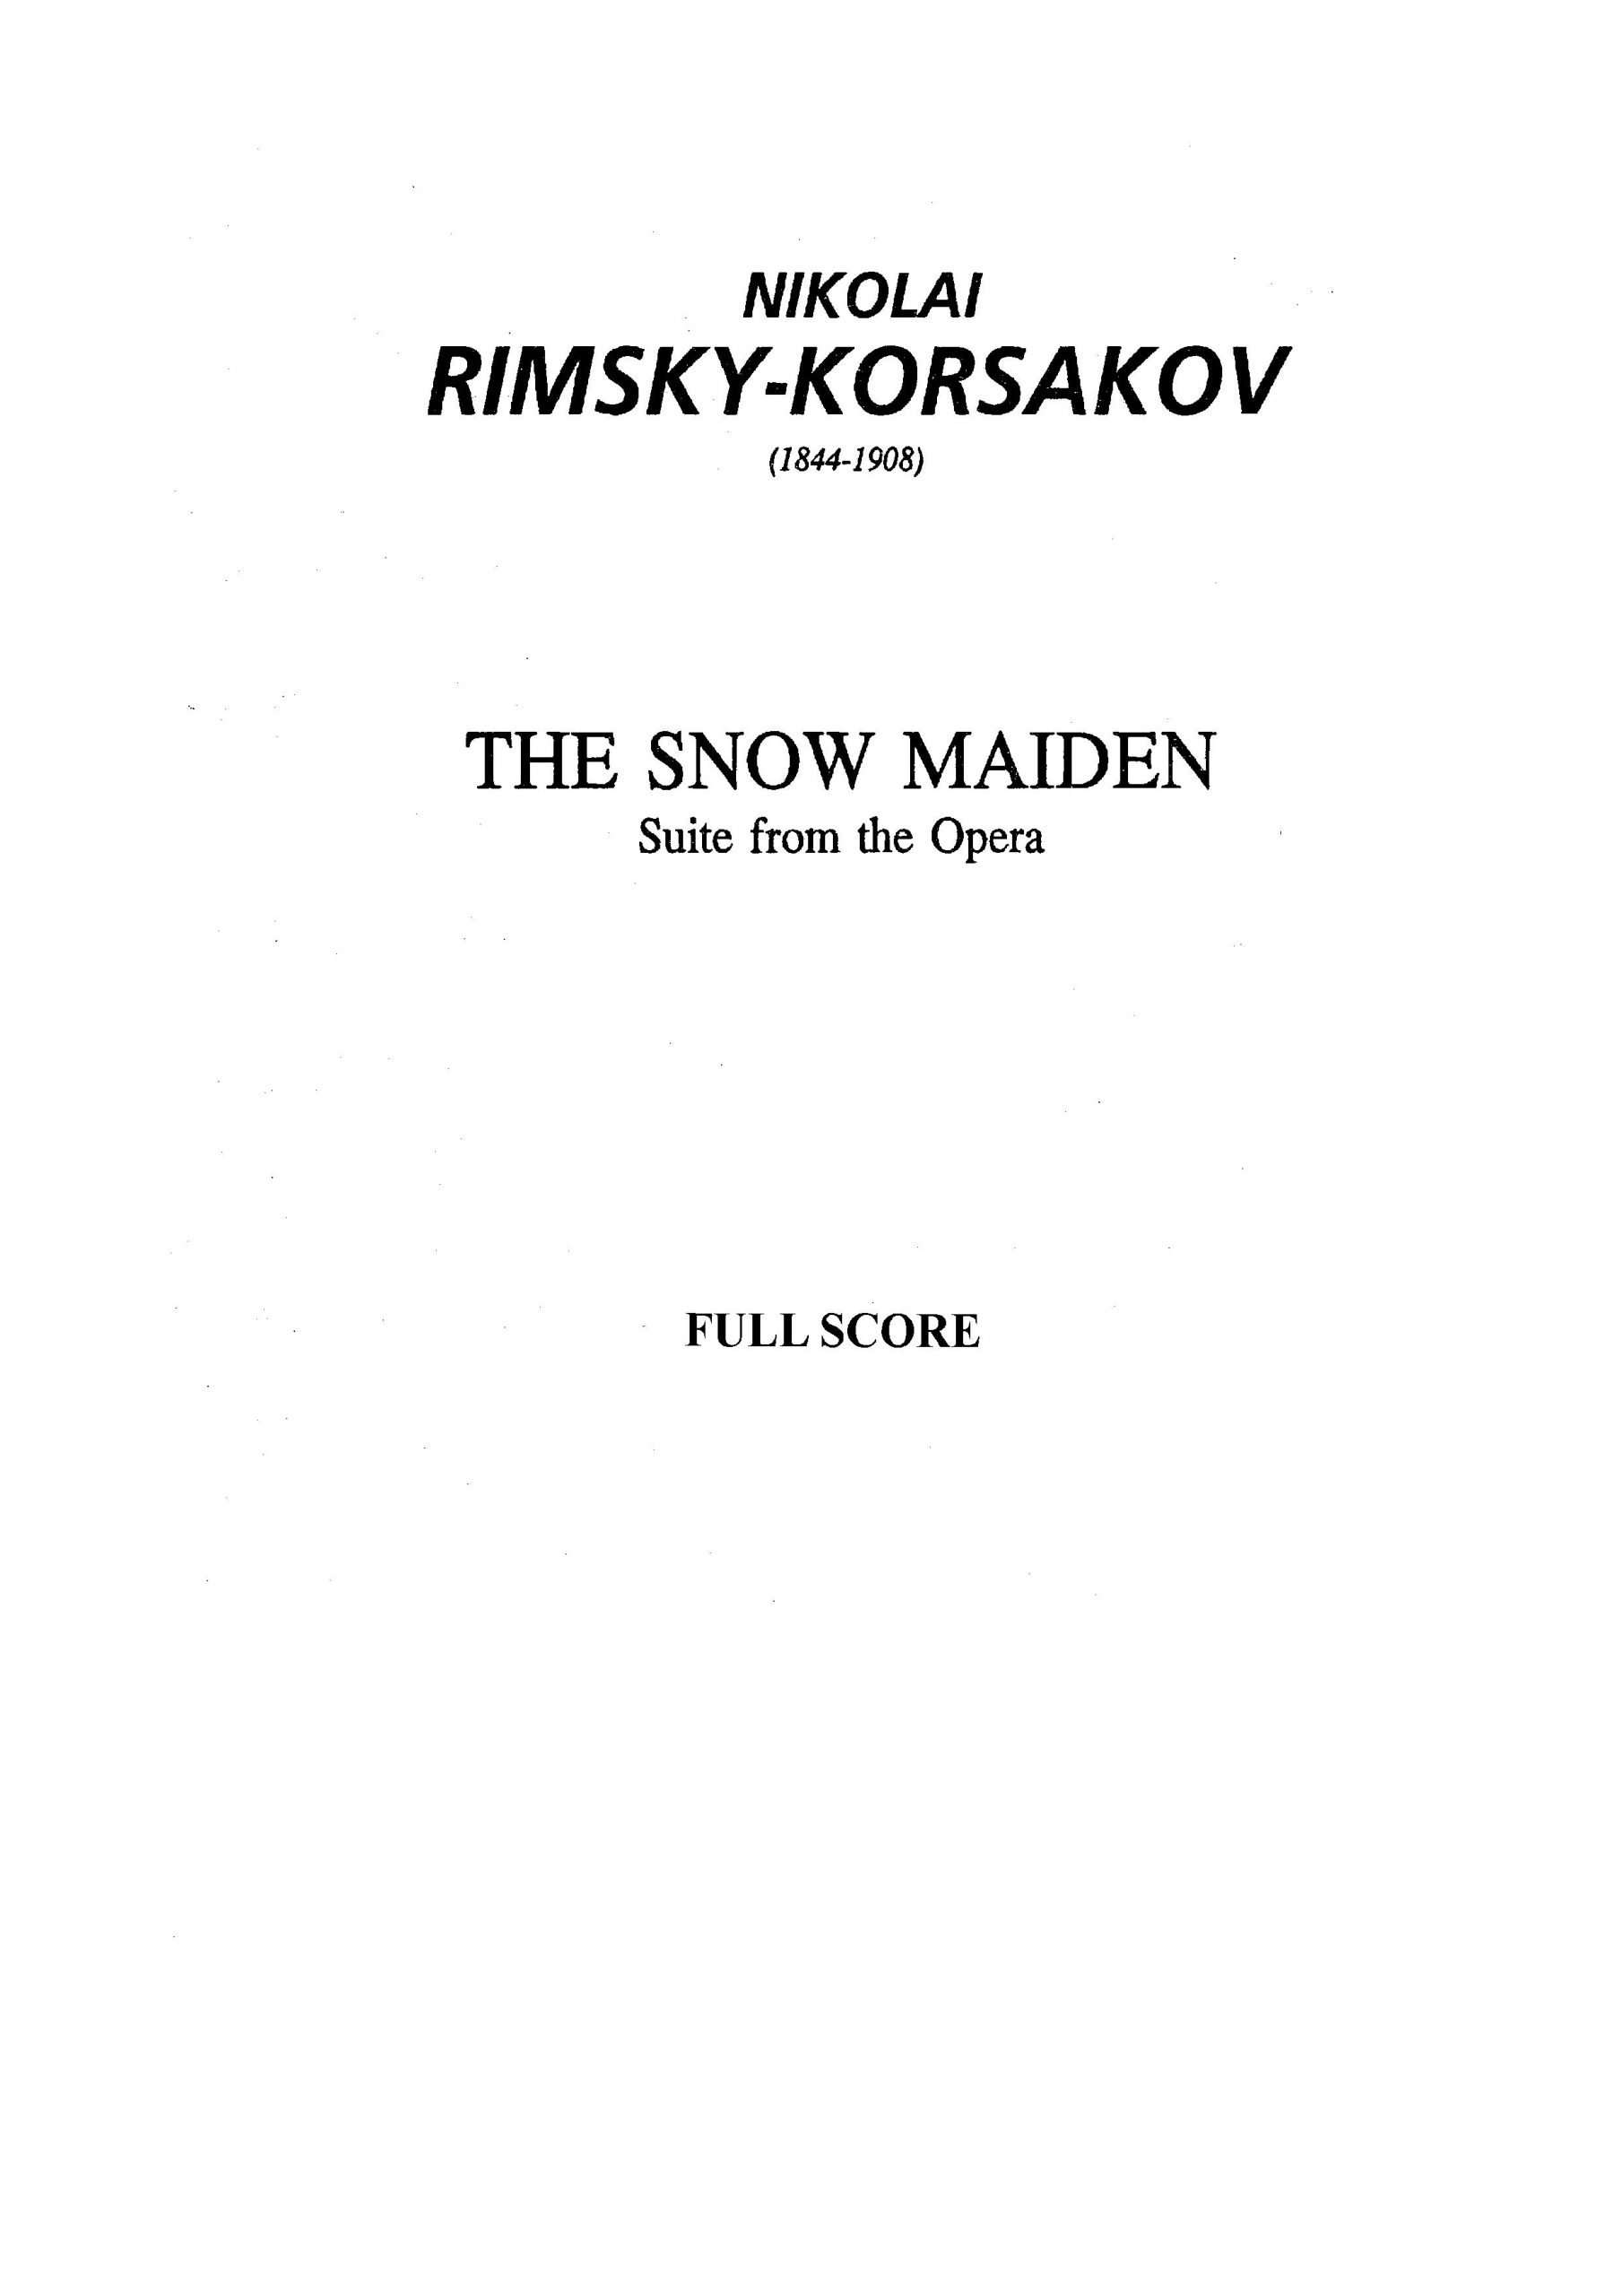 Rimsky-Korsakov, Nikolay - The Snow Maiden (suite) - Score